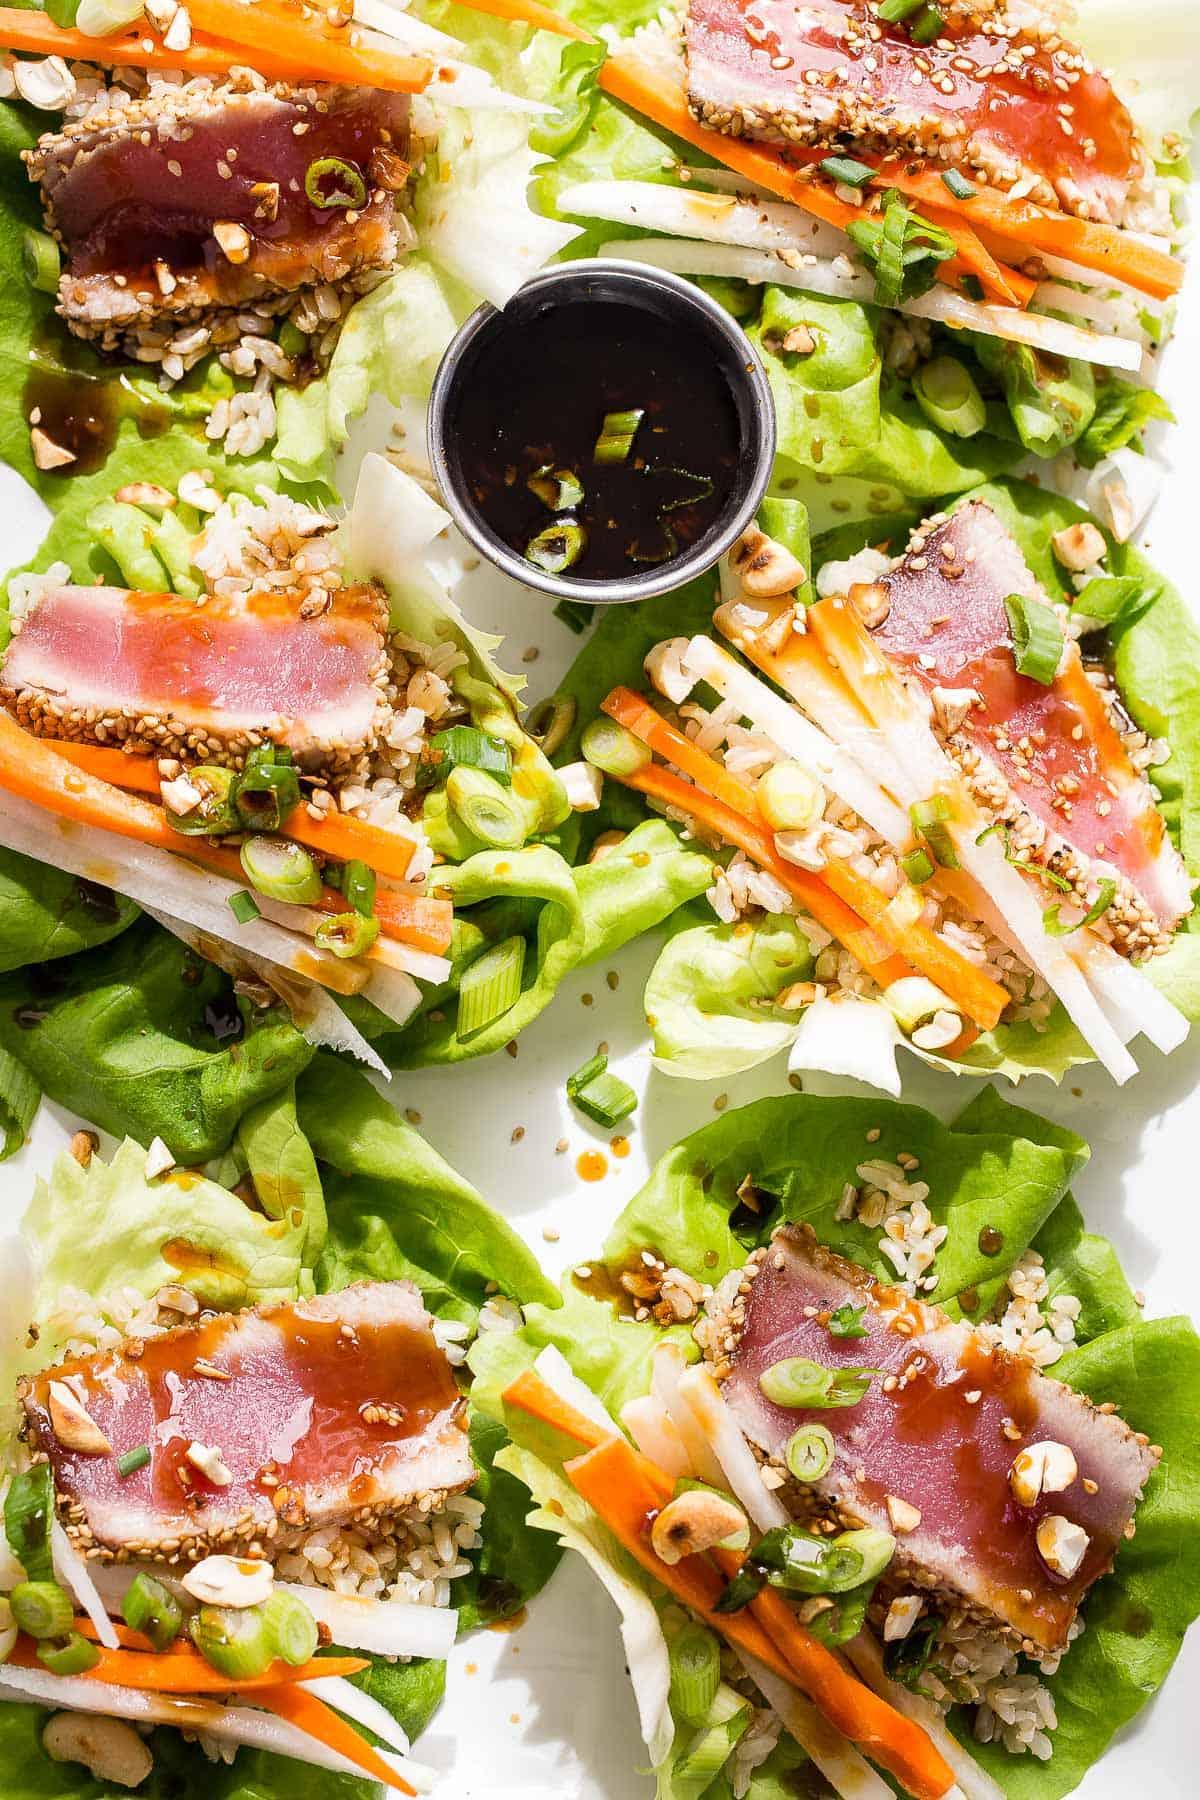 Sashimi grade seared ahi tuna with brown rice, daikon radish, carrots and topped with some homemade orange teriyaki sauce